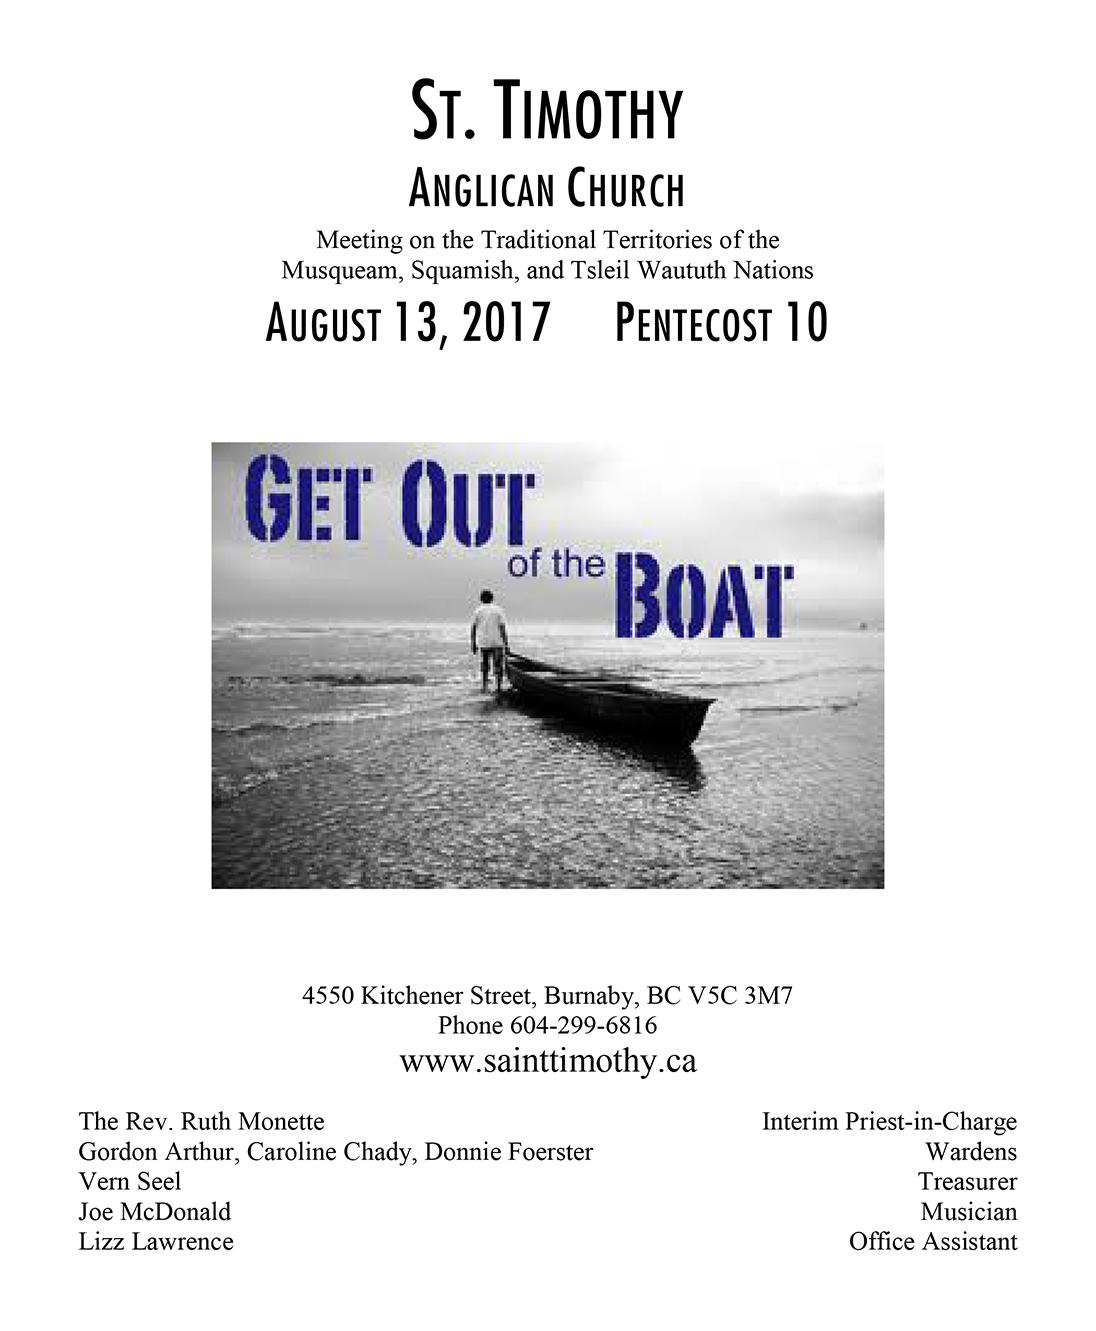 Bulletin: August 13, 2017